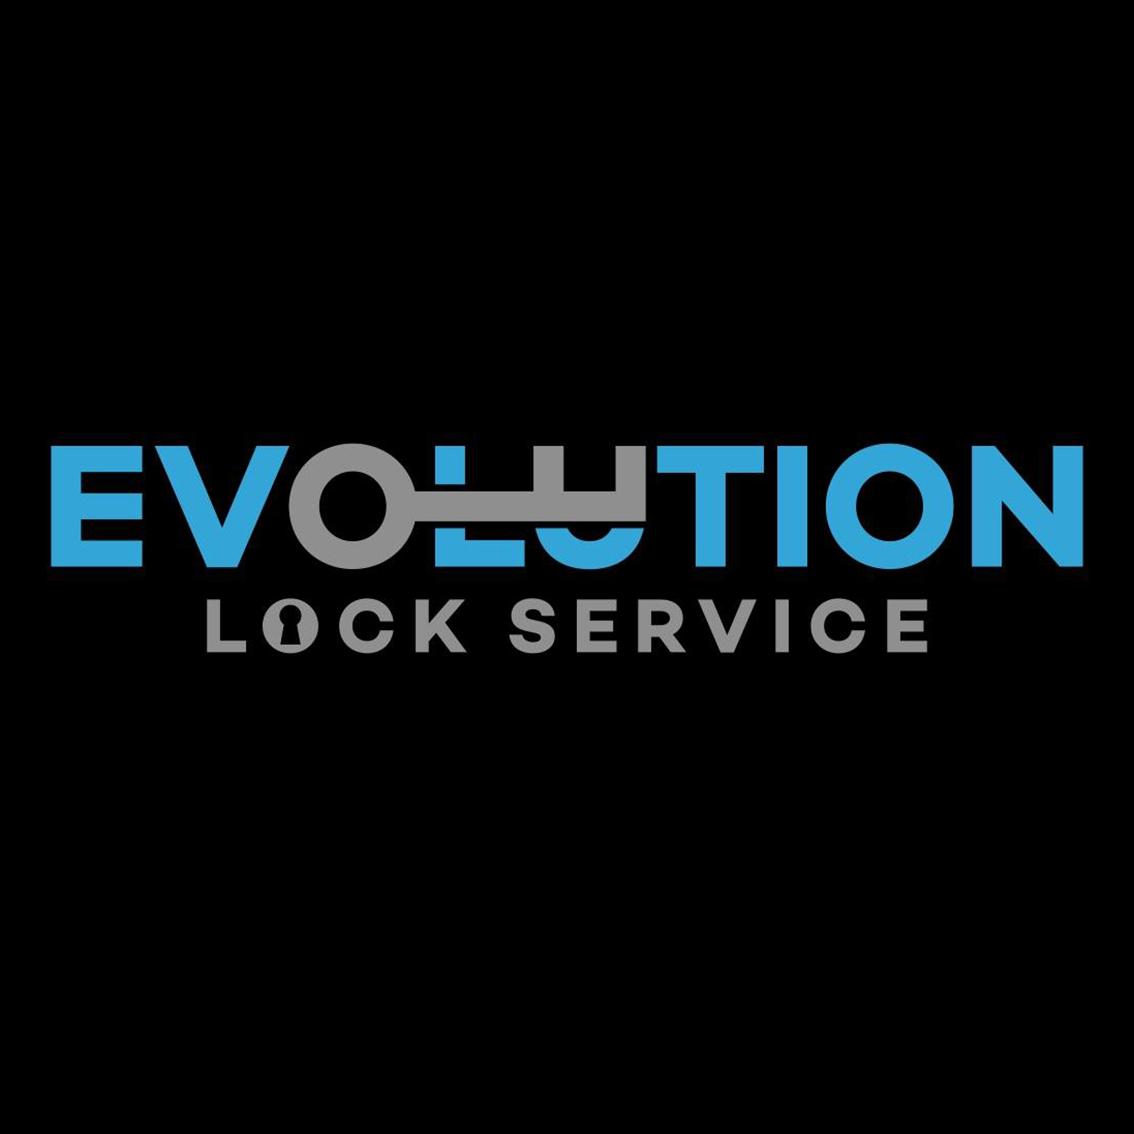 Evolution Lock Service Joondalup